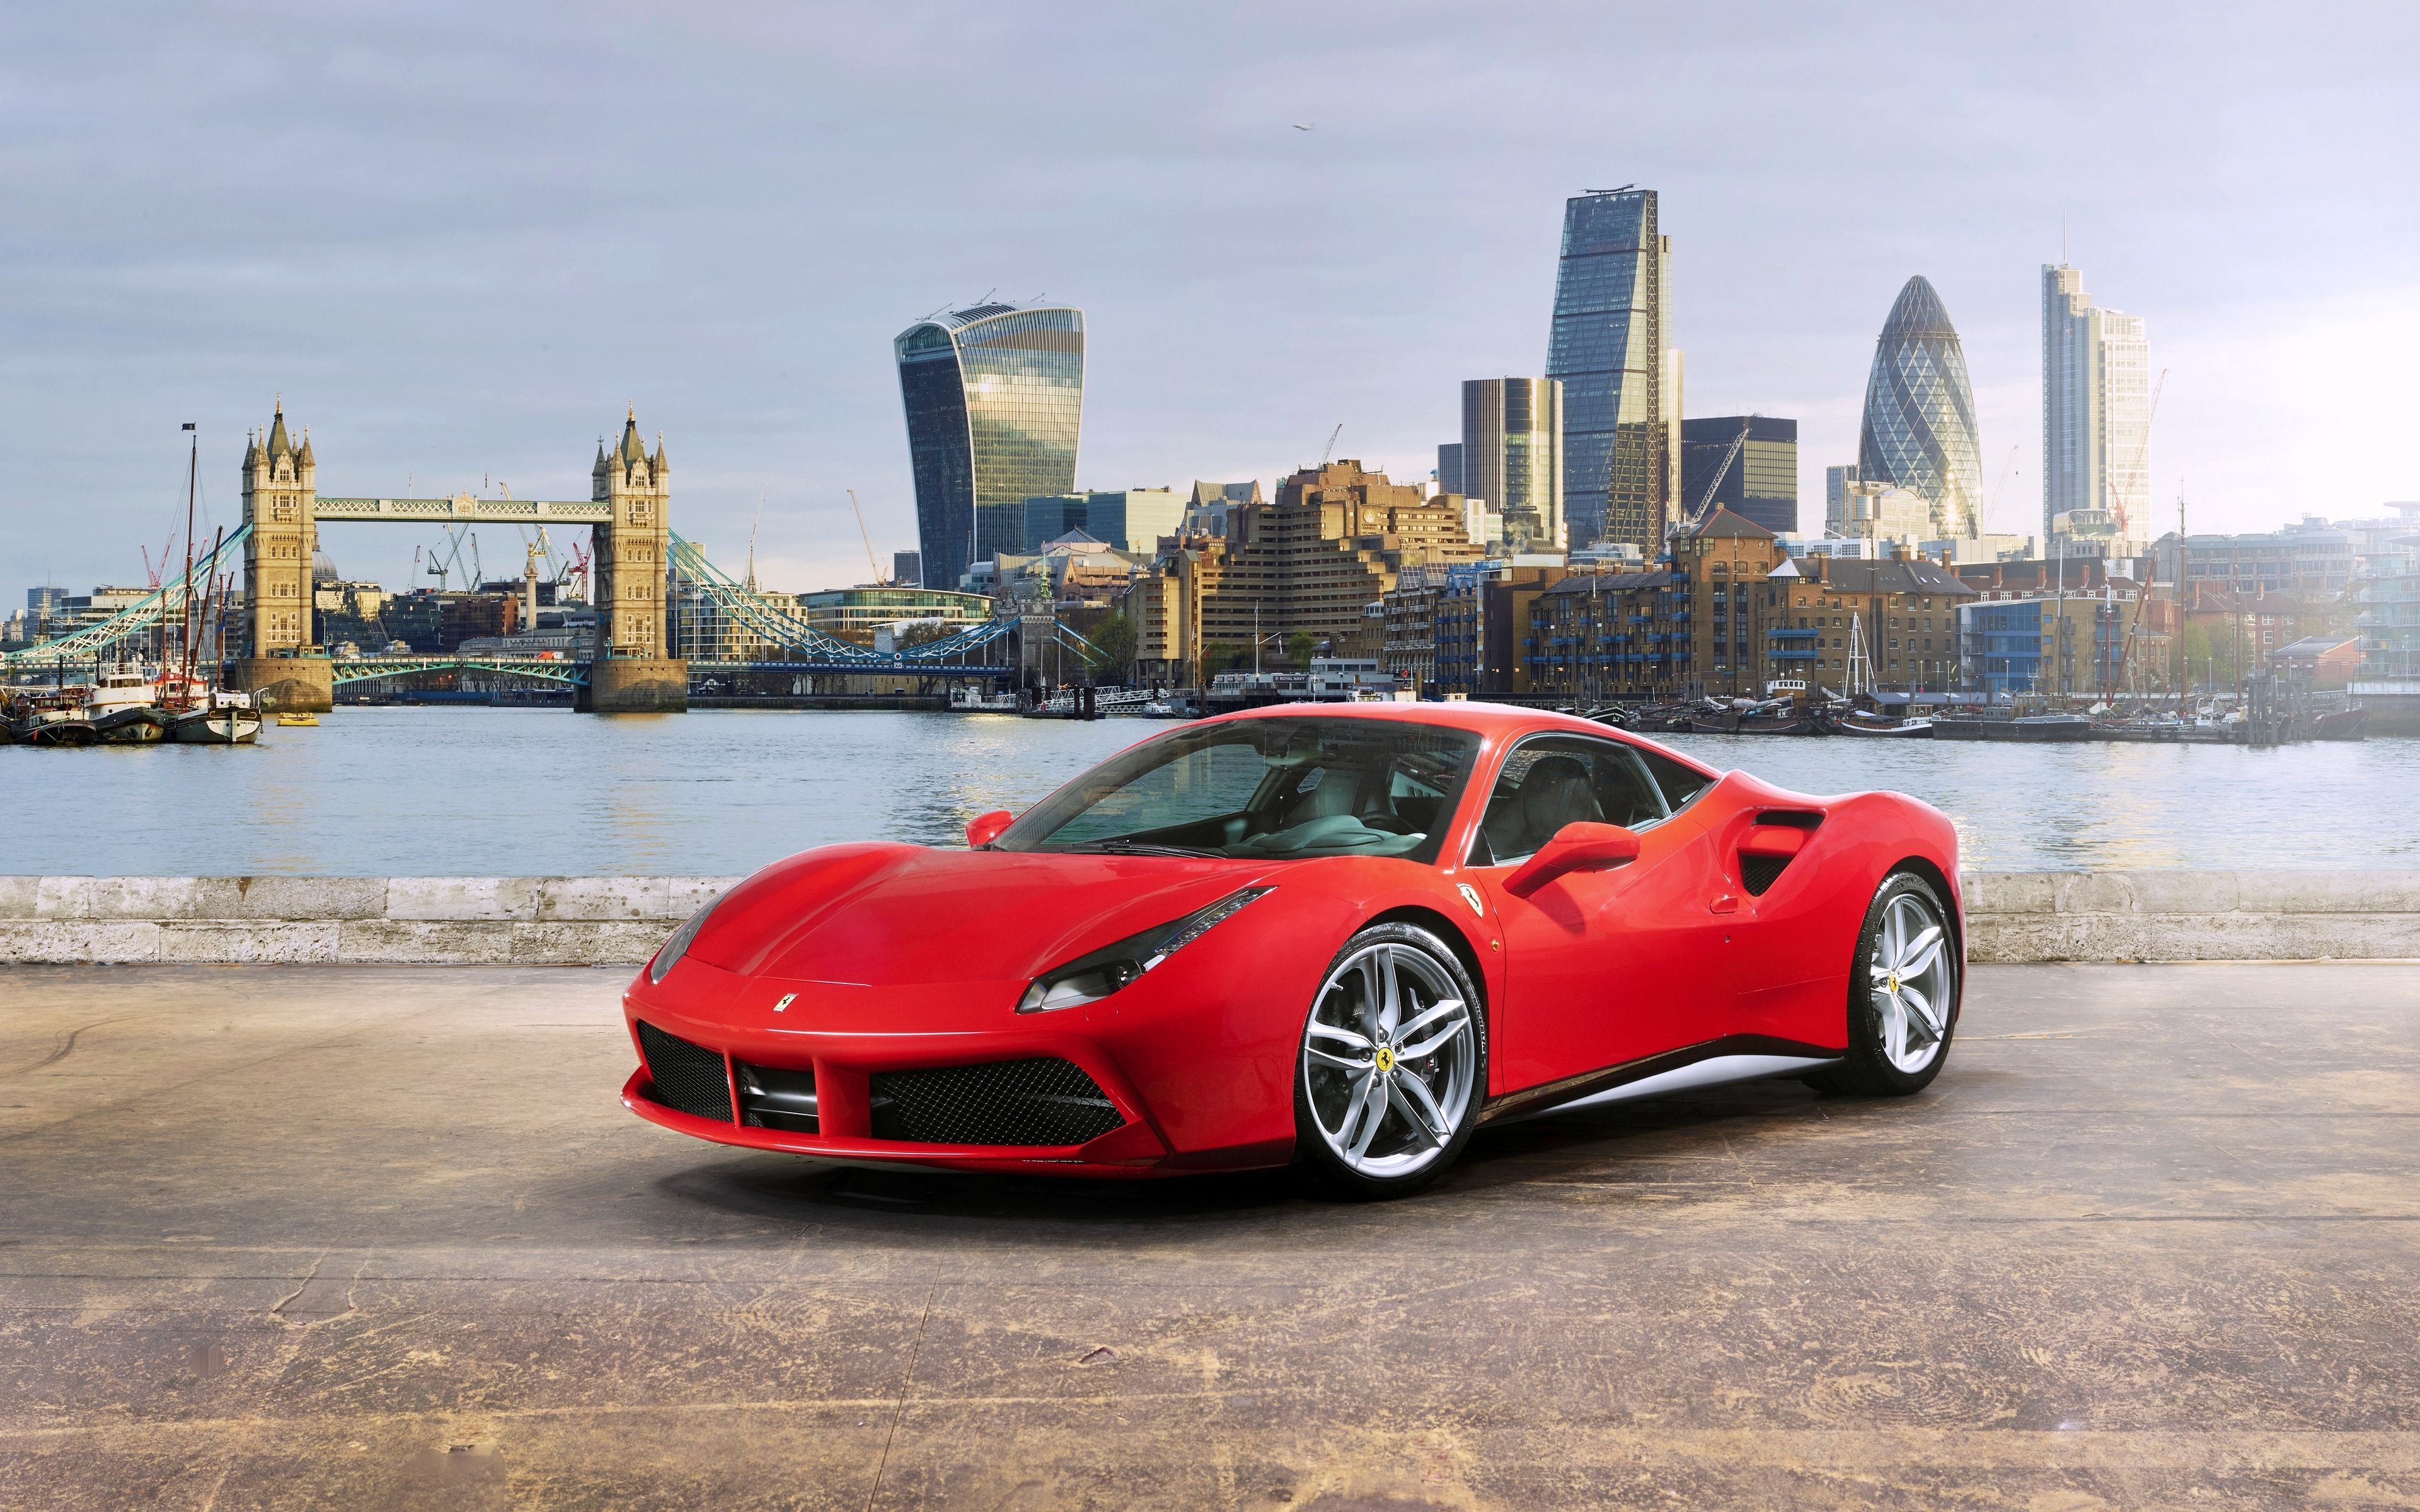 Ferrari 4k Wallpapers Top Free Ferrari 4k Backgrounds Wallpaperaccess